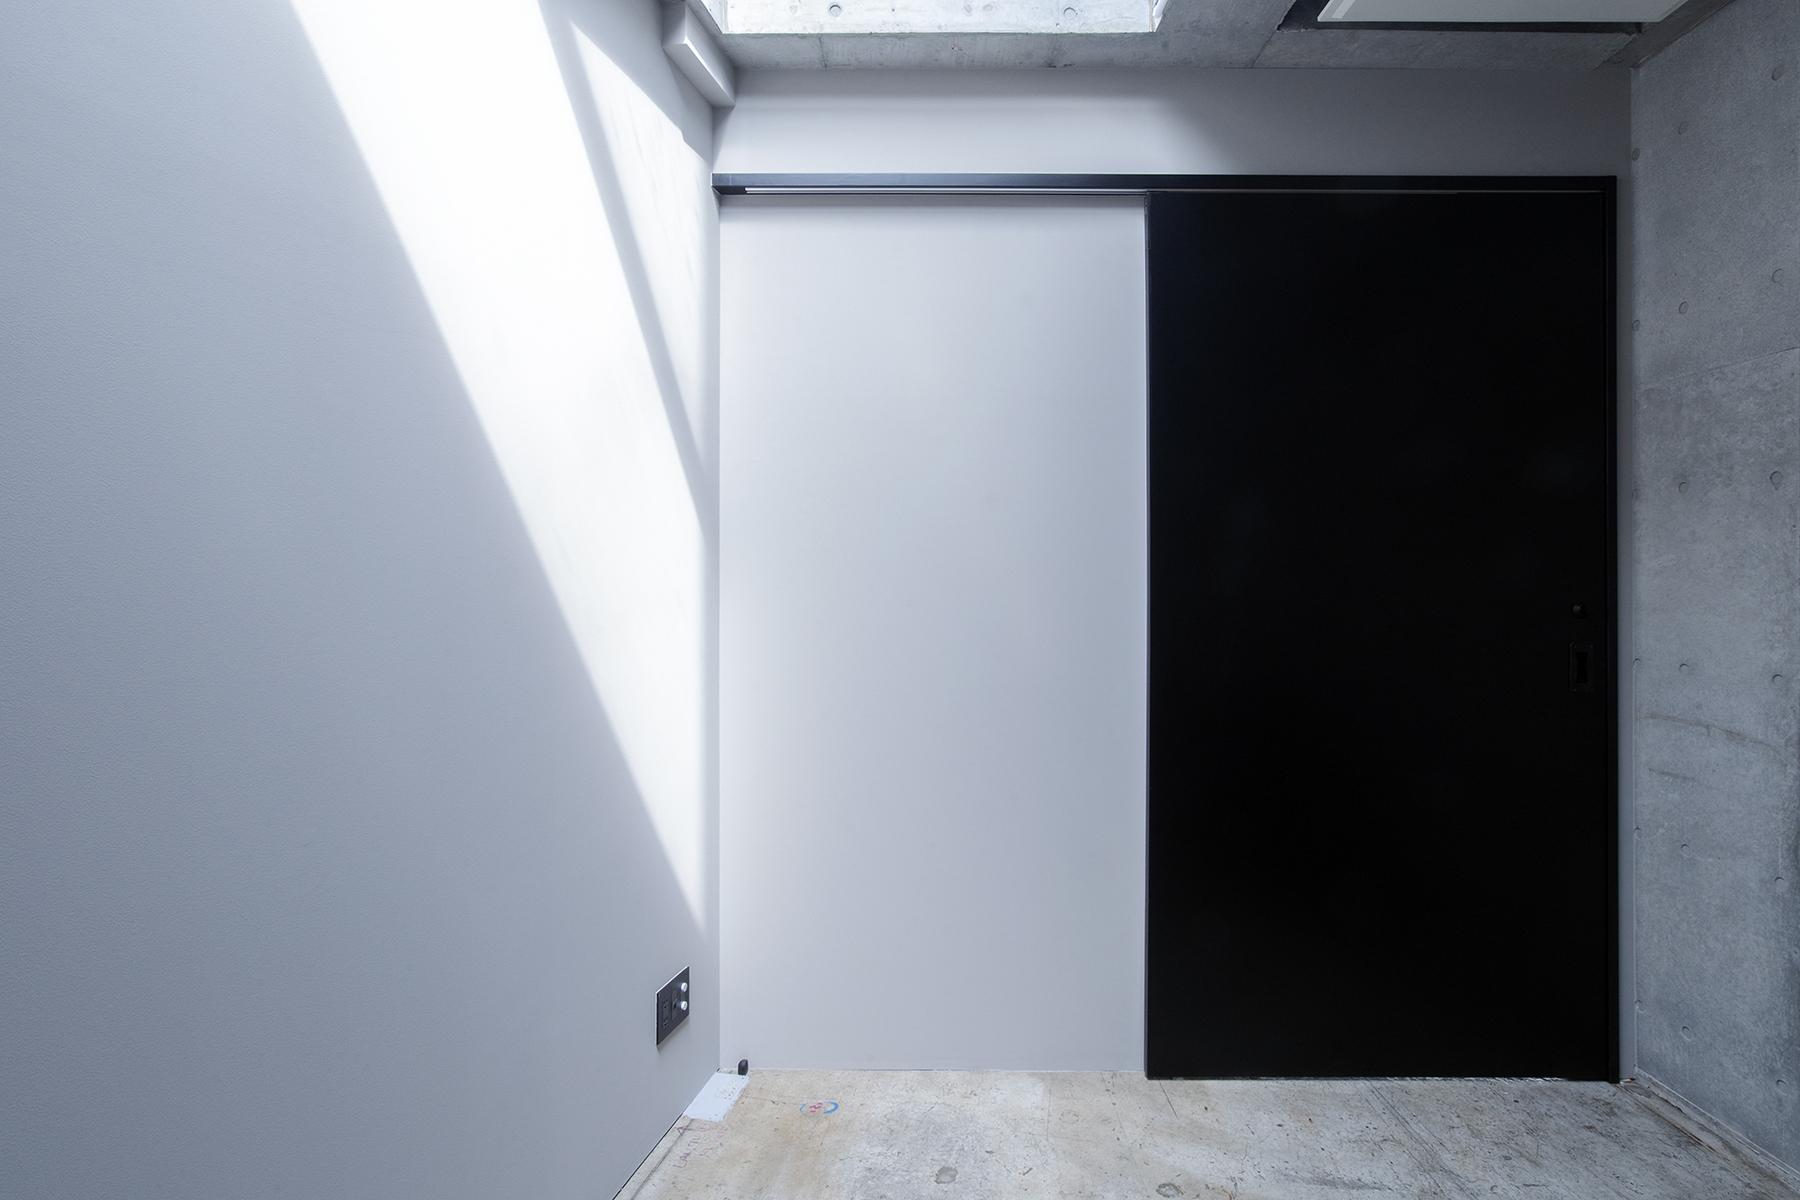 OPRCT Space R (オプレクト)天窓の小部屋 / 西北西方角